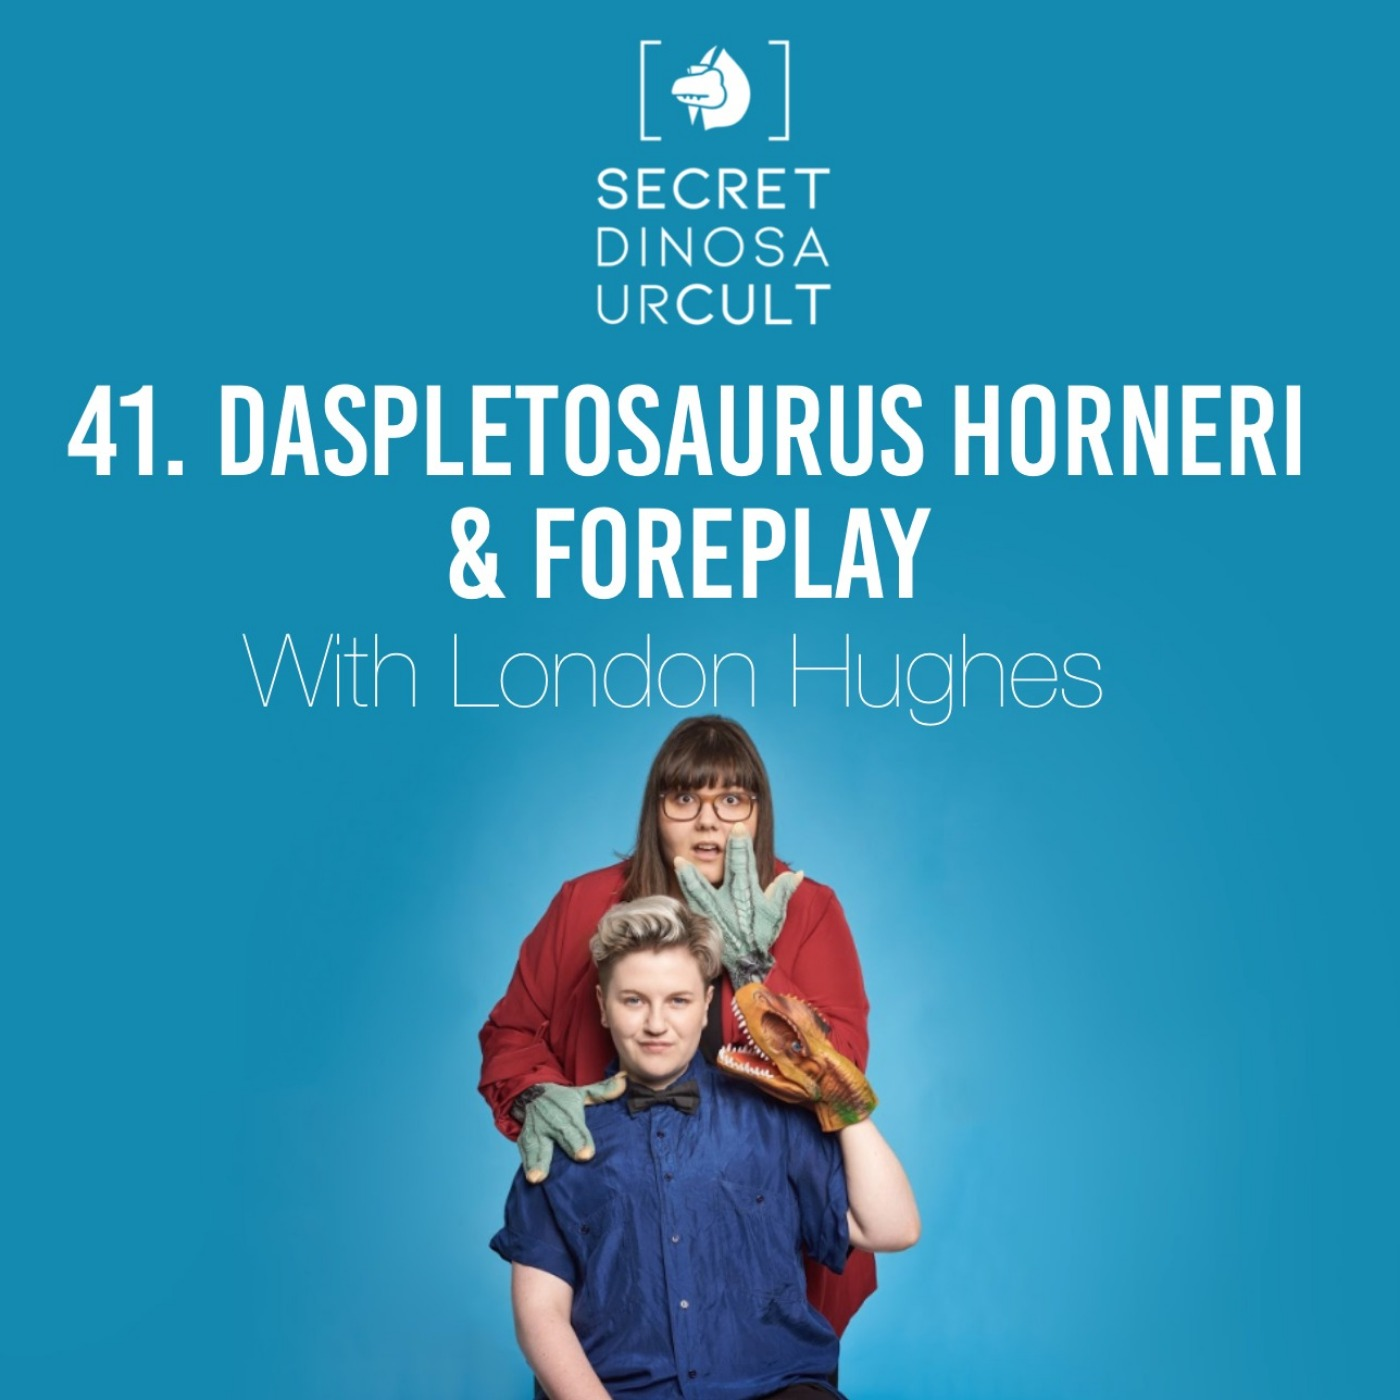 Daspletosaurus Horneri & Foreplay with London Hughes